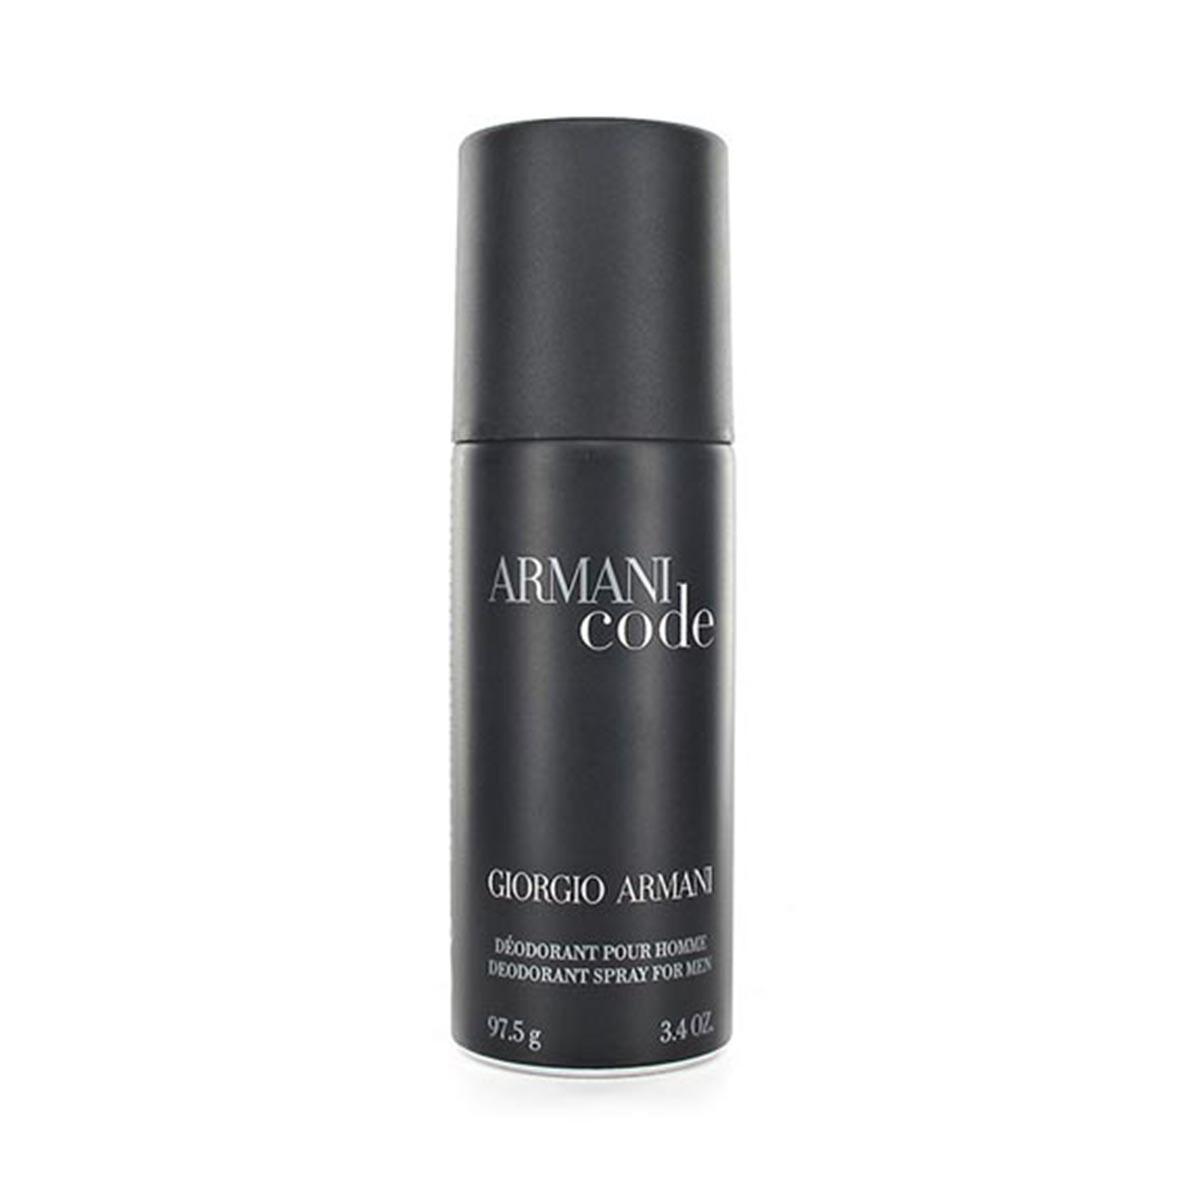 Giorgio Armani Code Deodorant Spray 150ml One Size